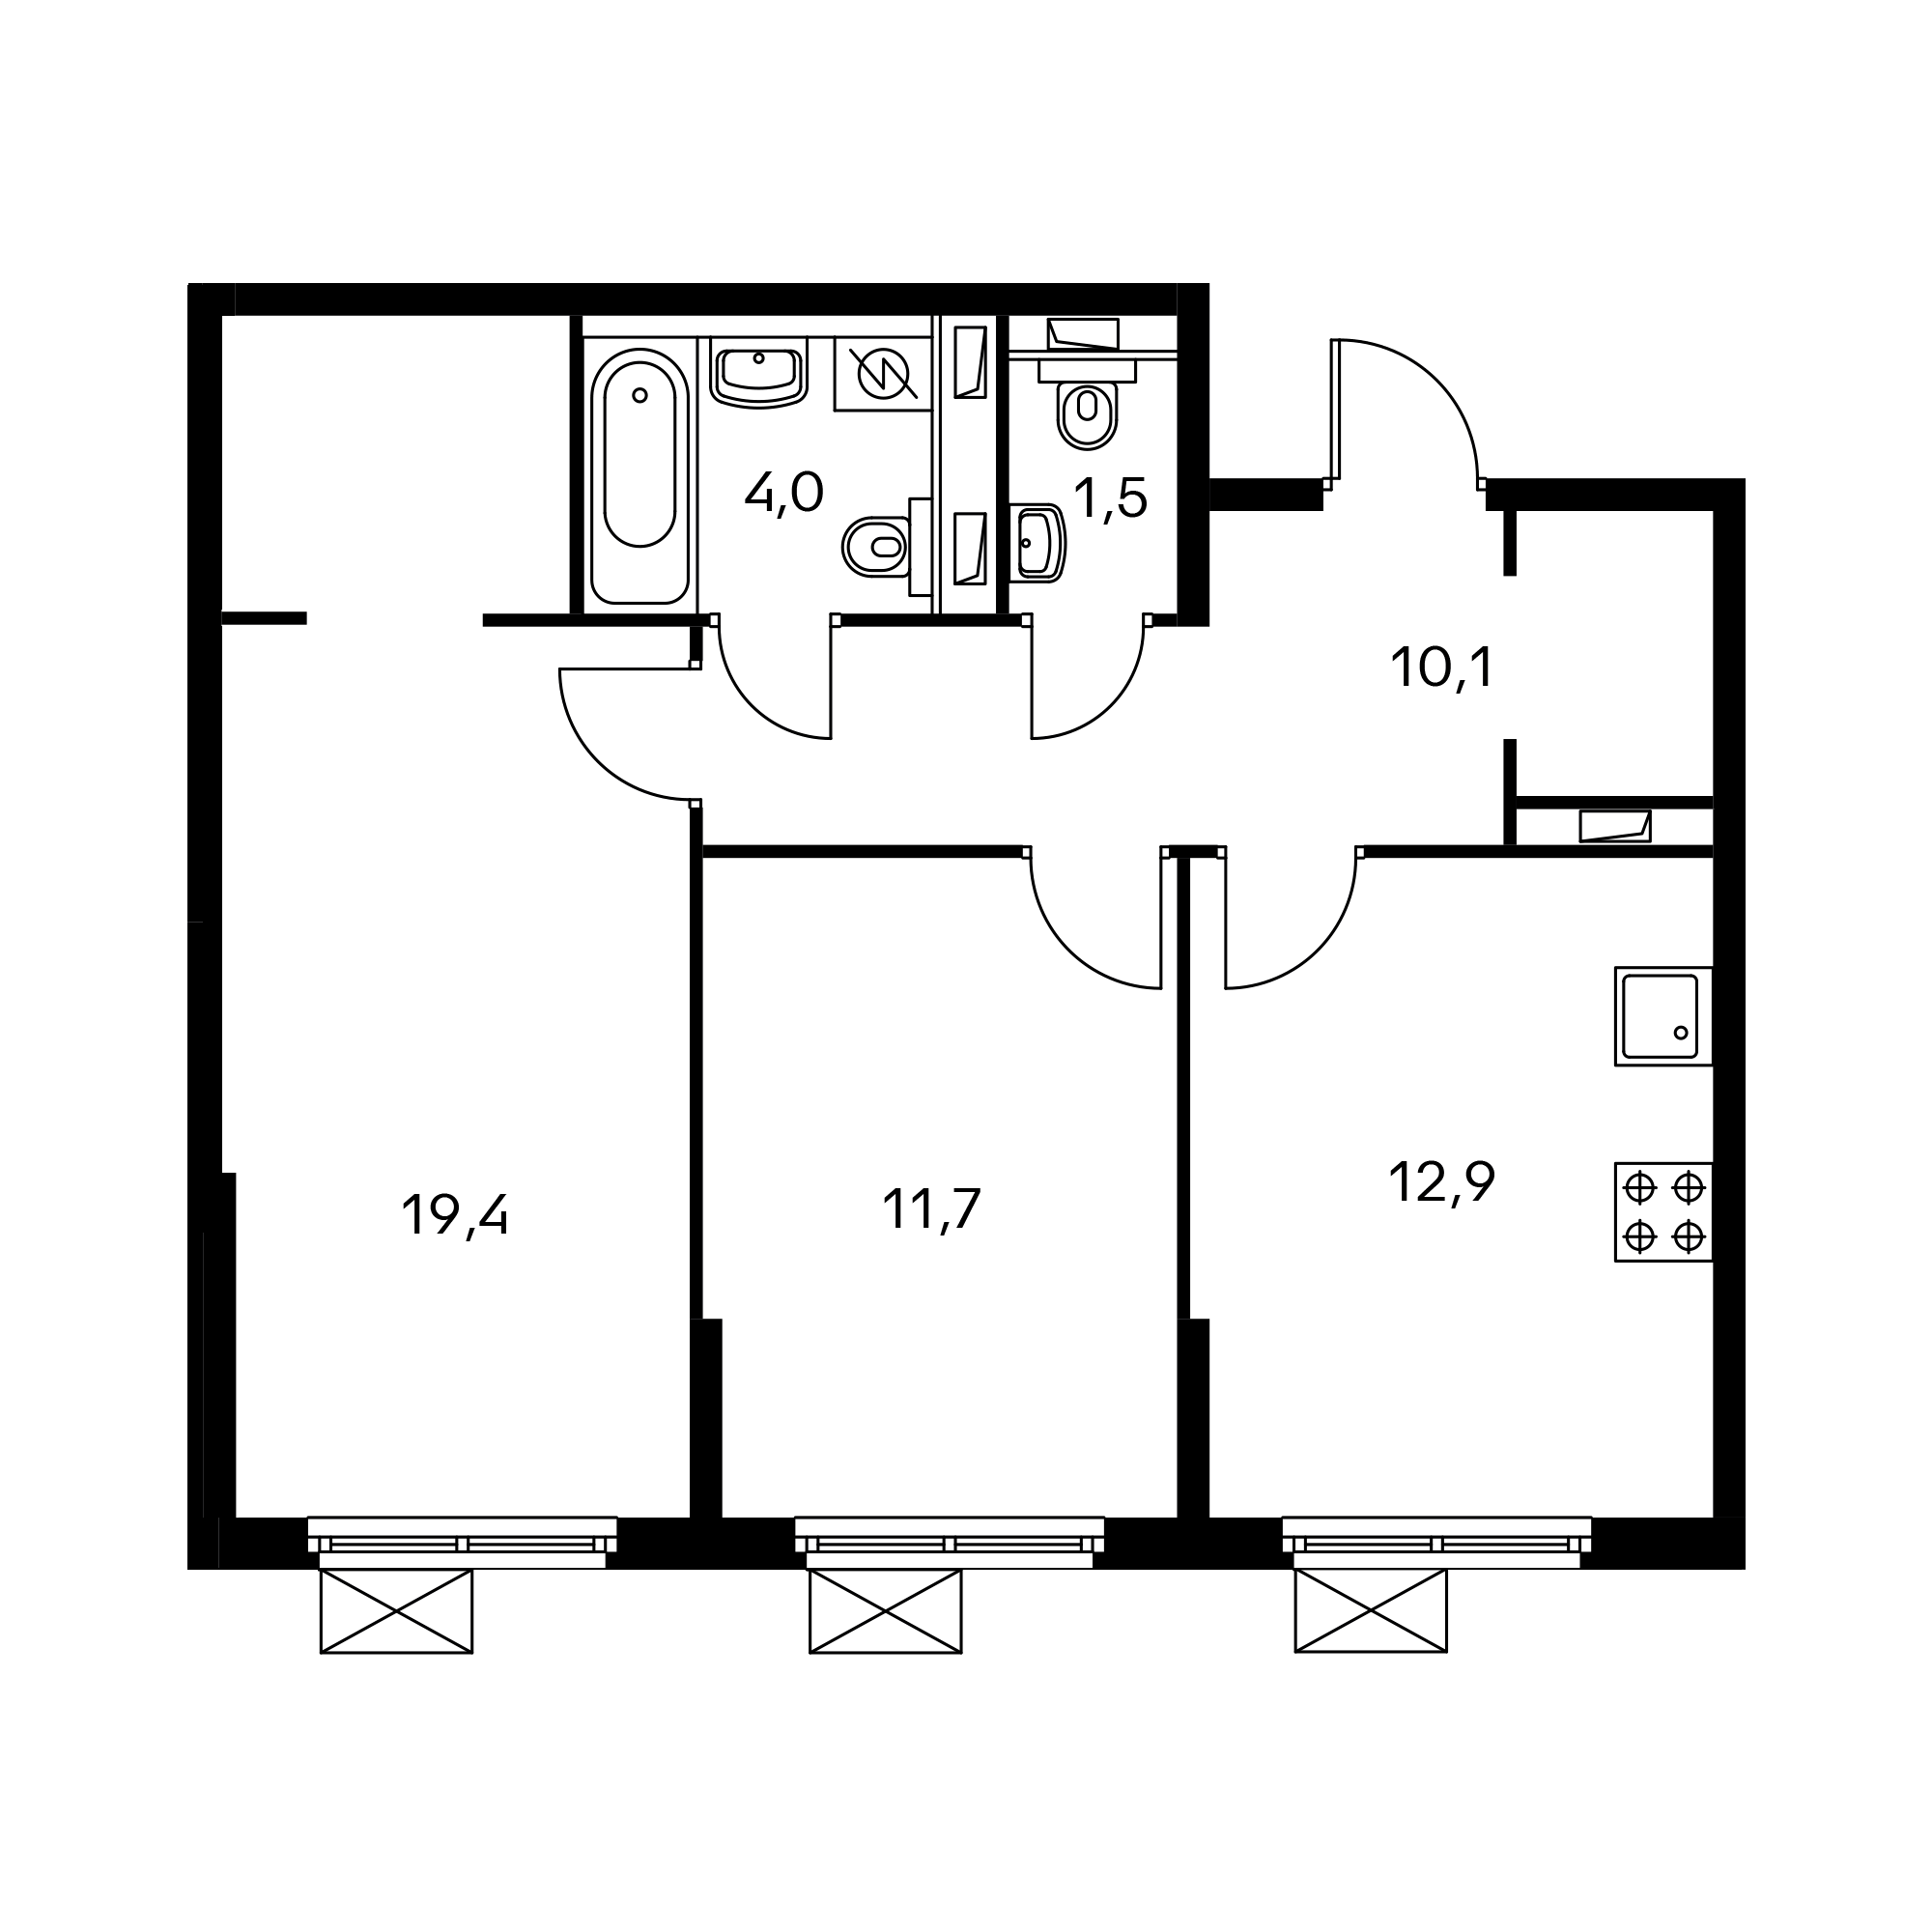 2KM4_9.3-1_S_Z9